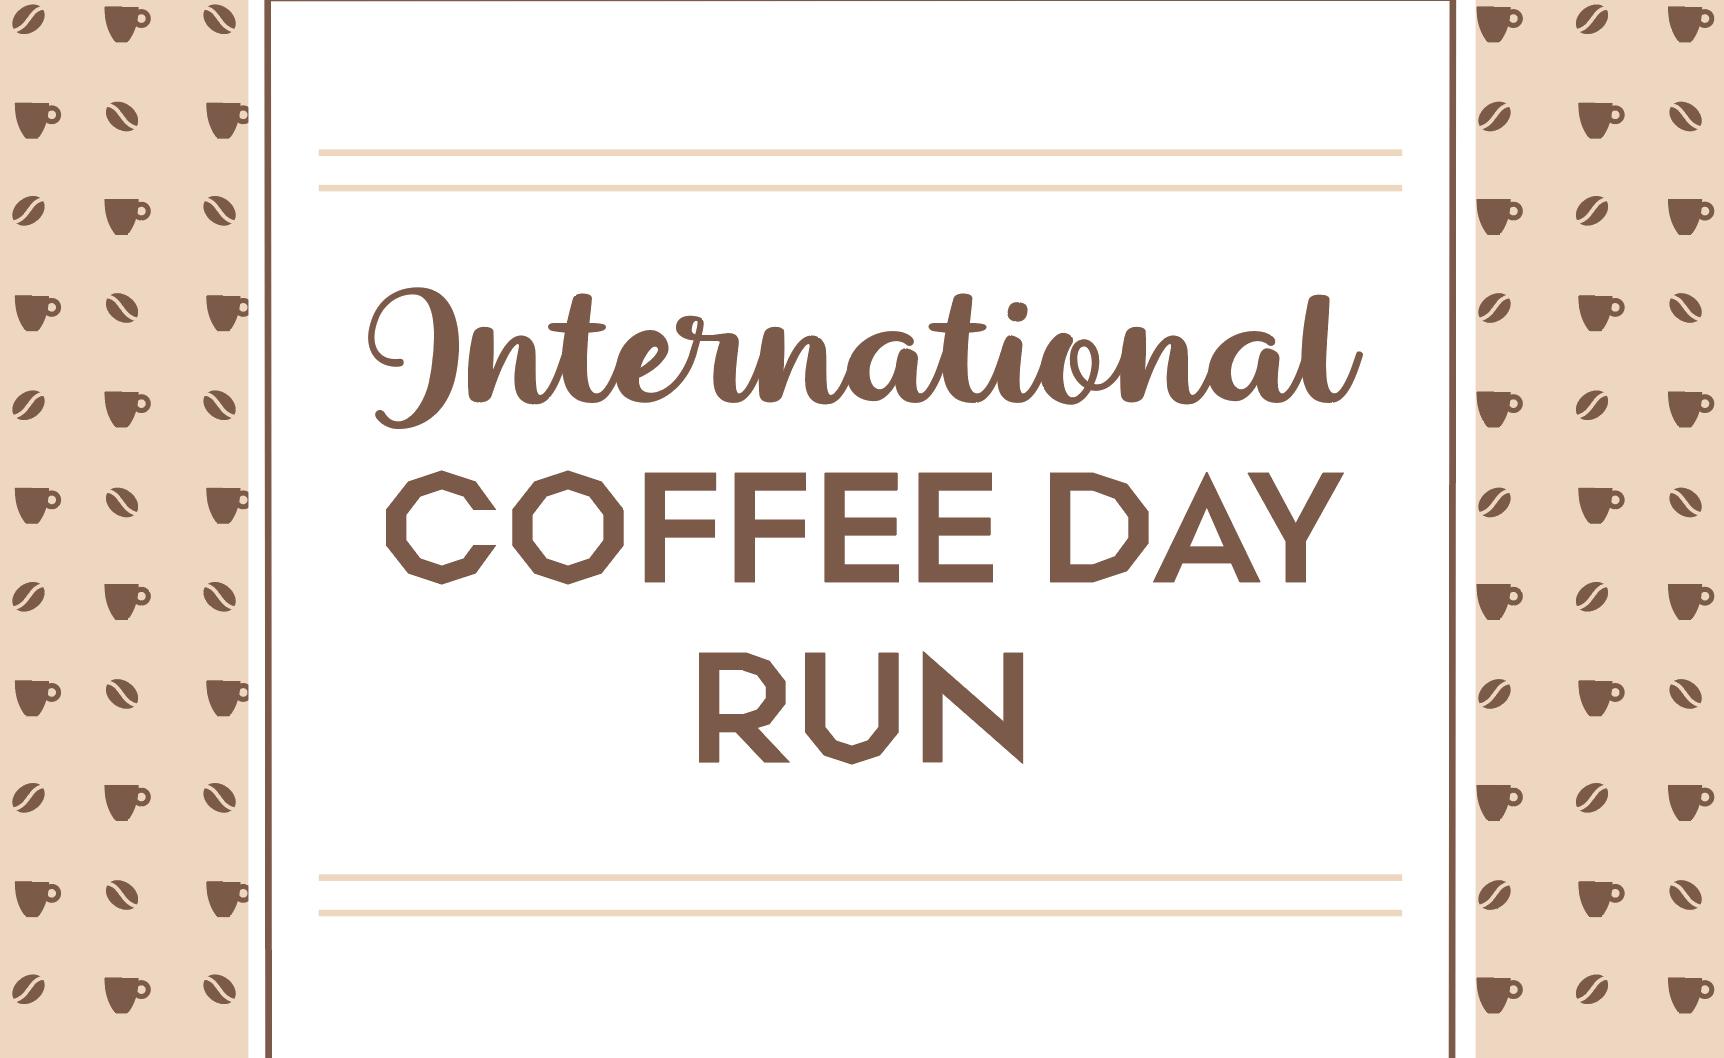 International Coffee Day Run